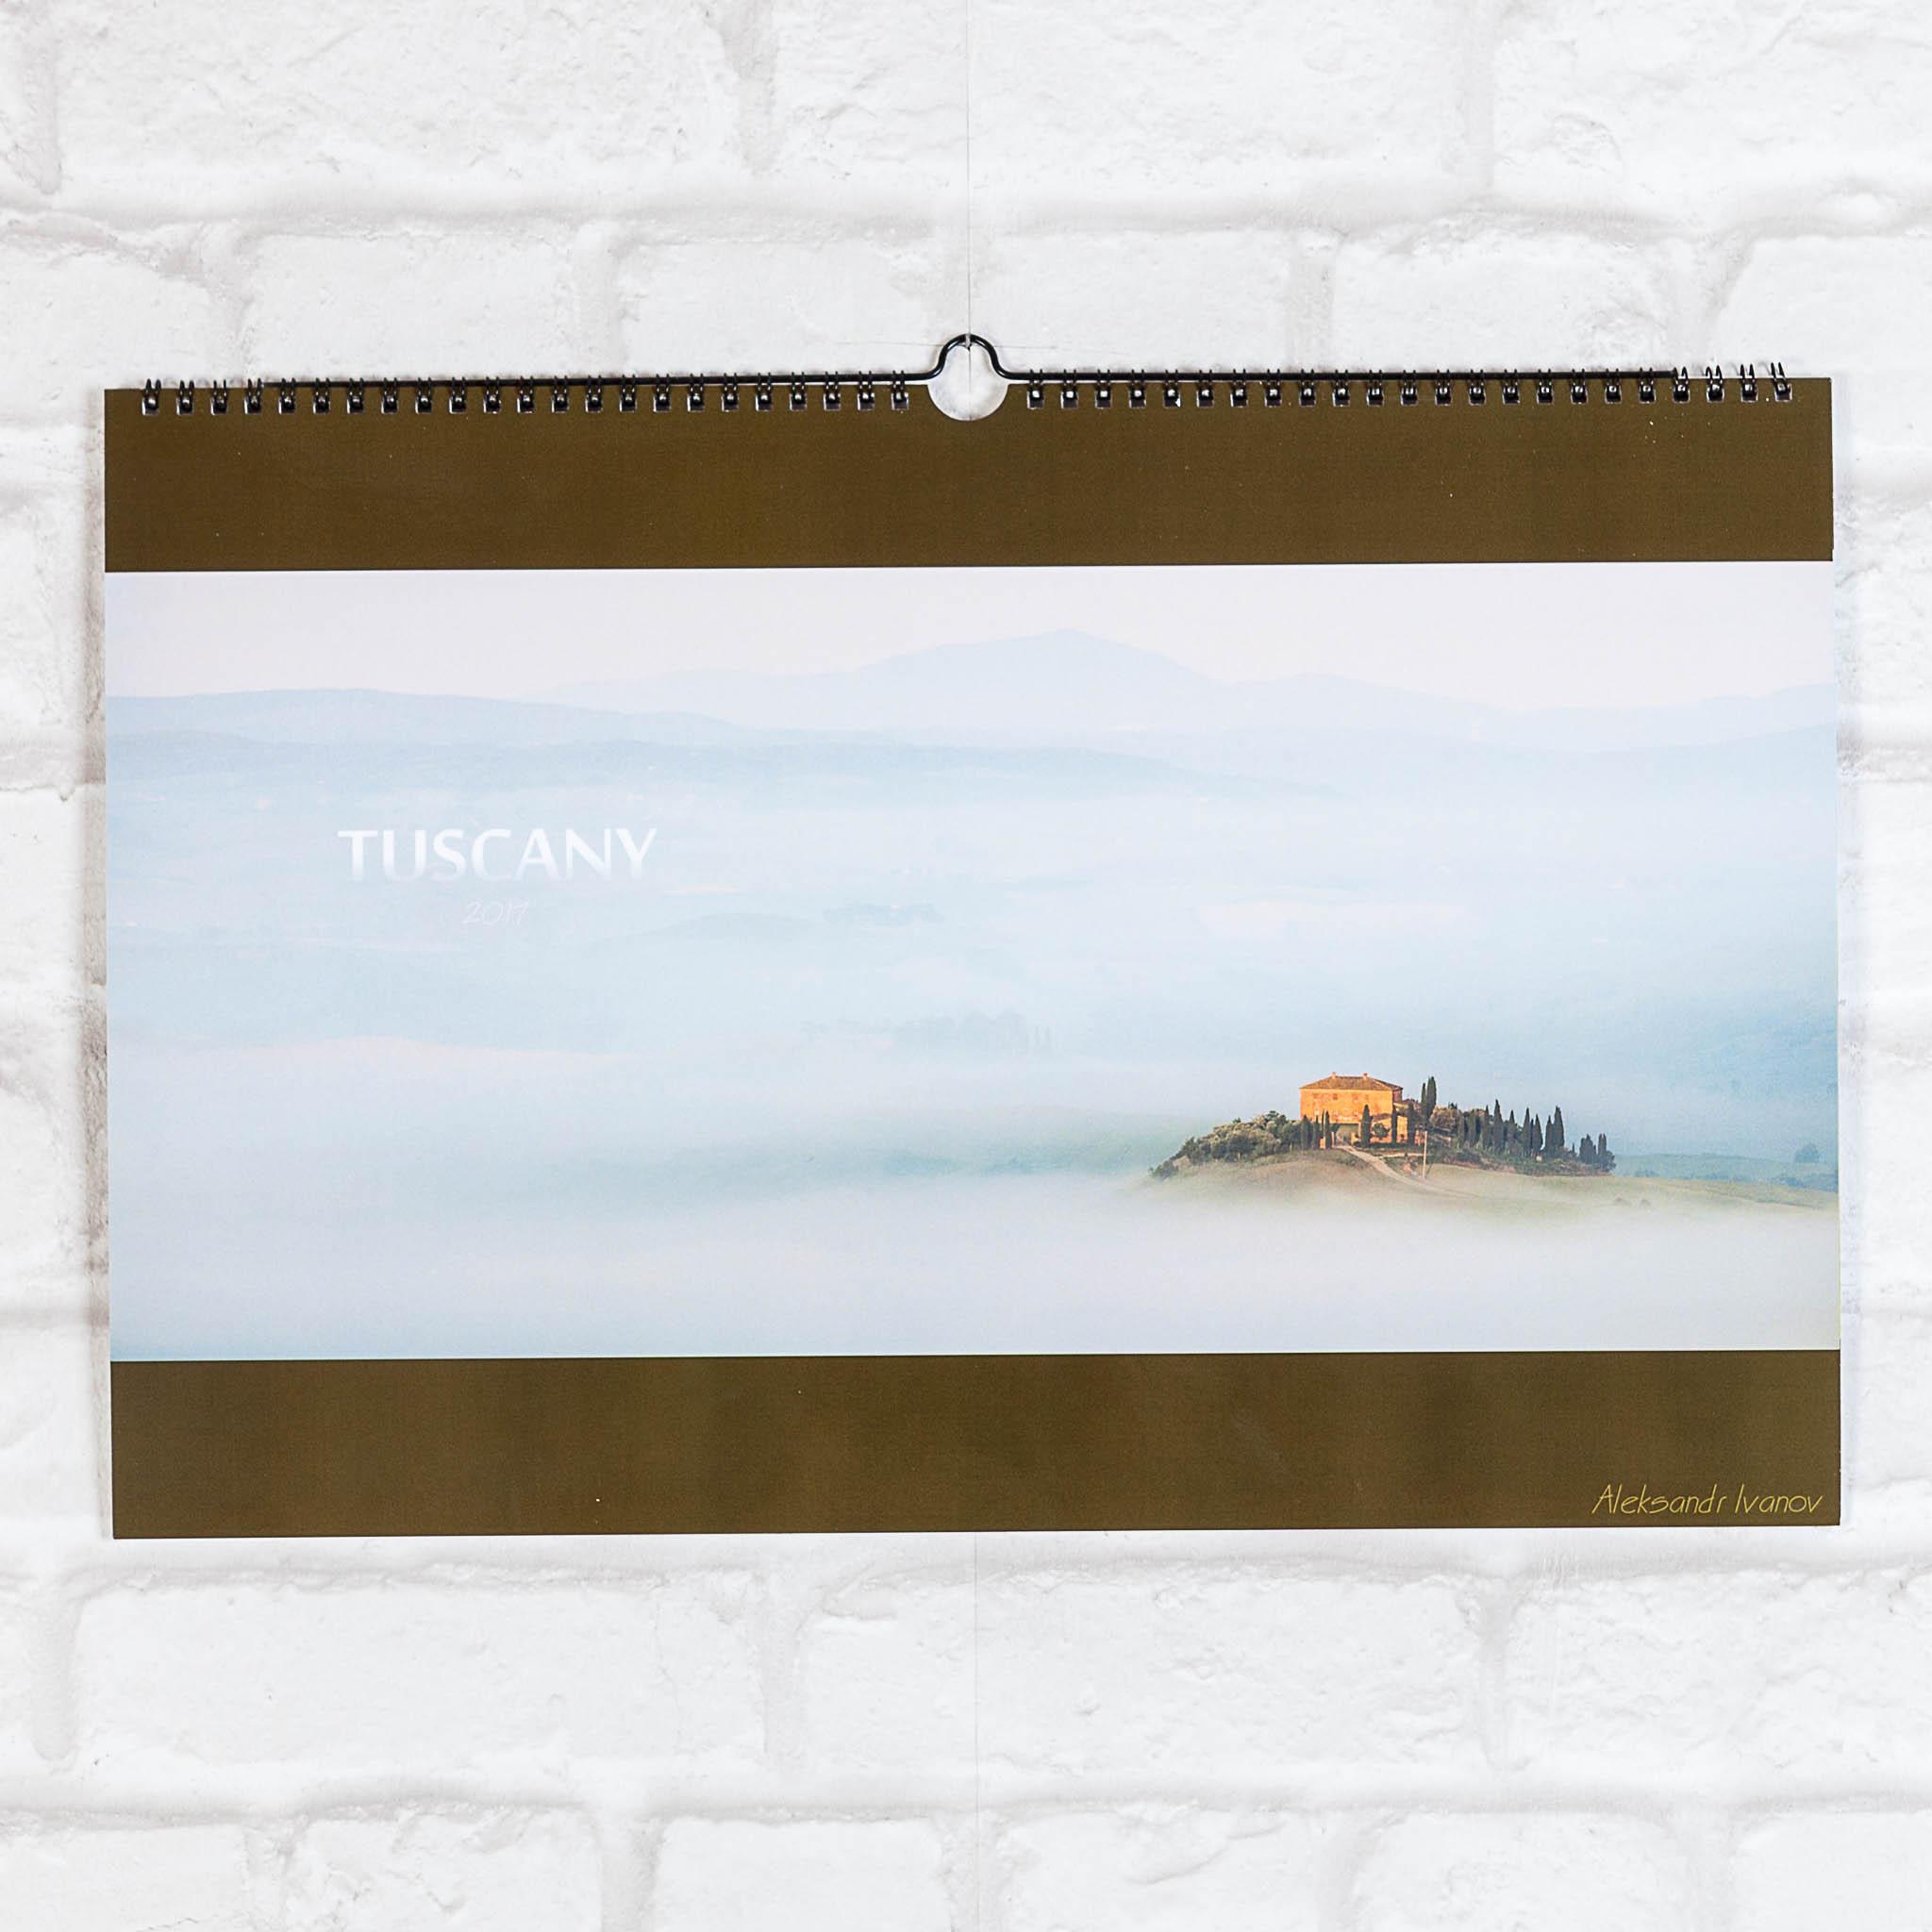 Обложка календаря Тоскана Александр Иванов